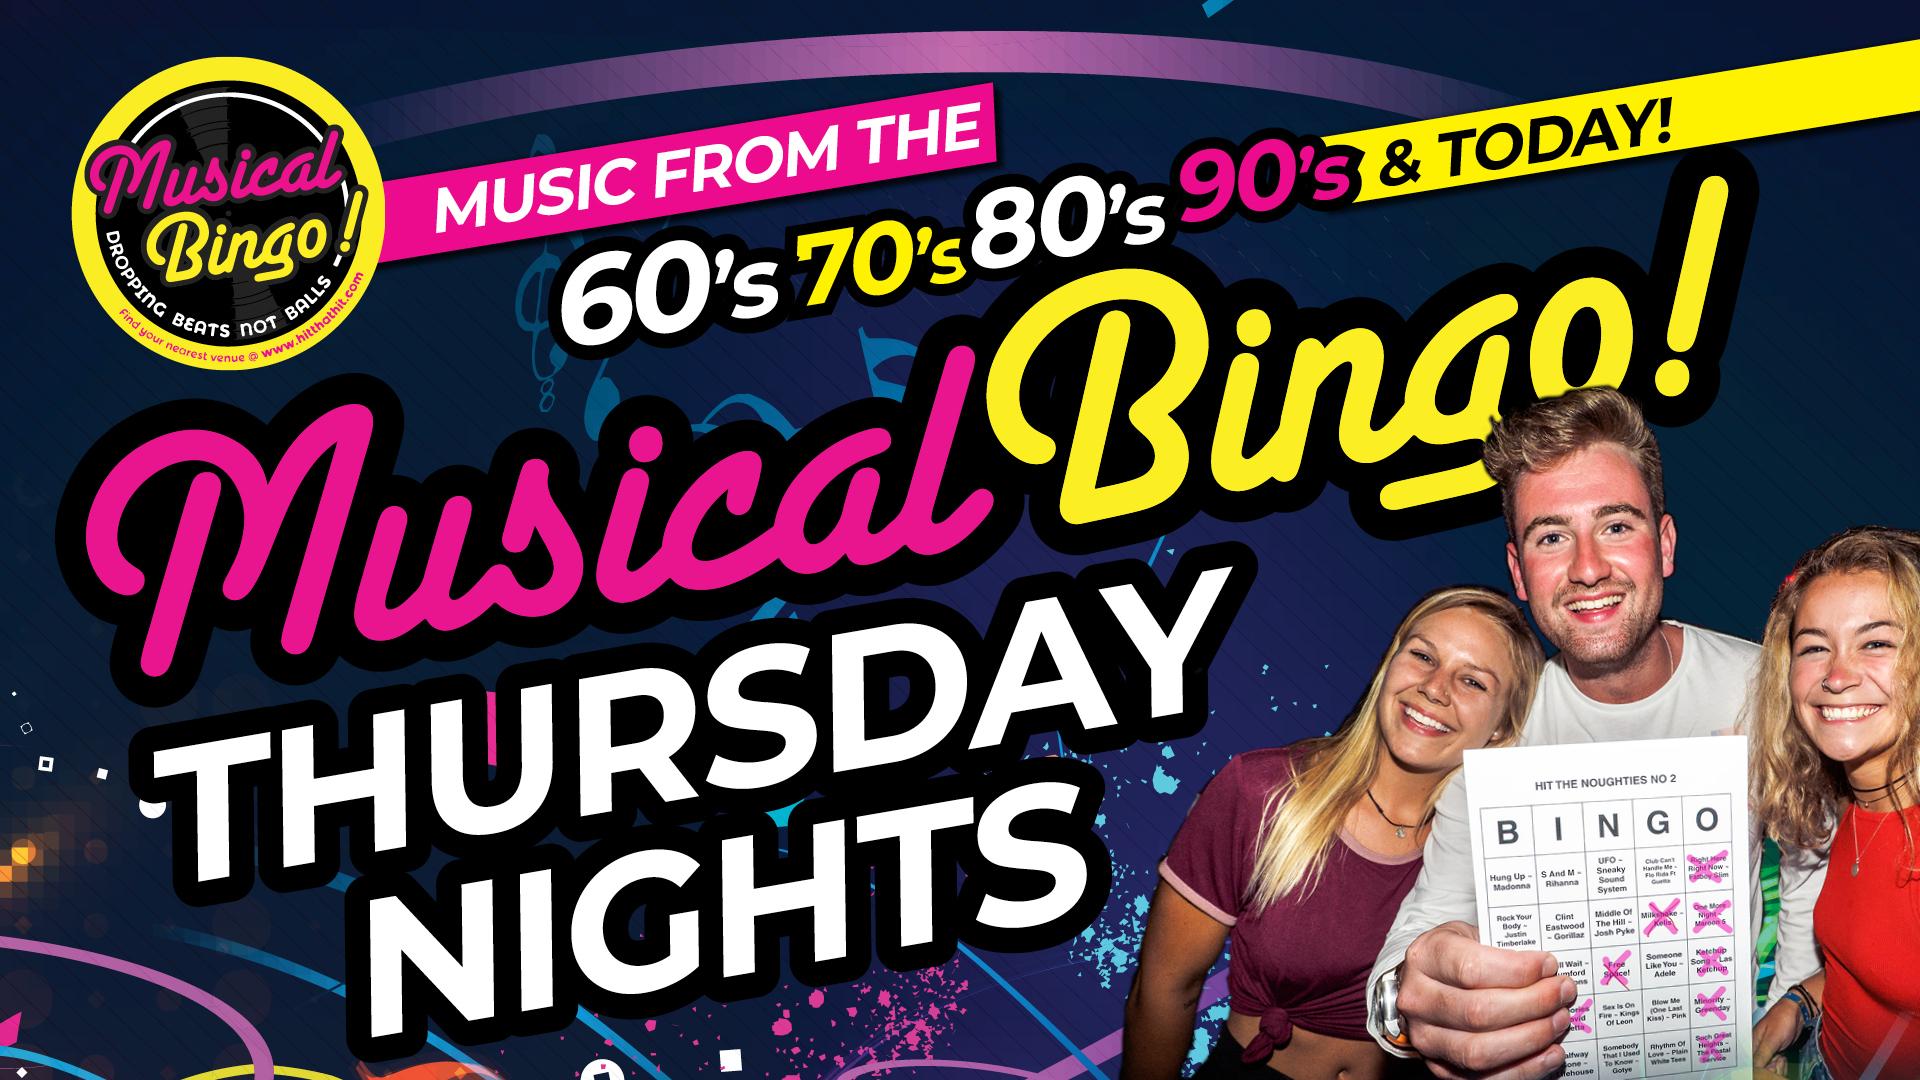 Musical Bingo Nightlife Graphic - Thursday.jpg